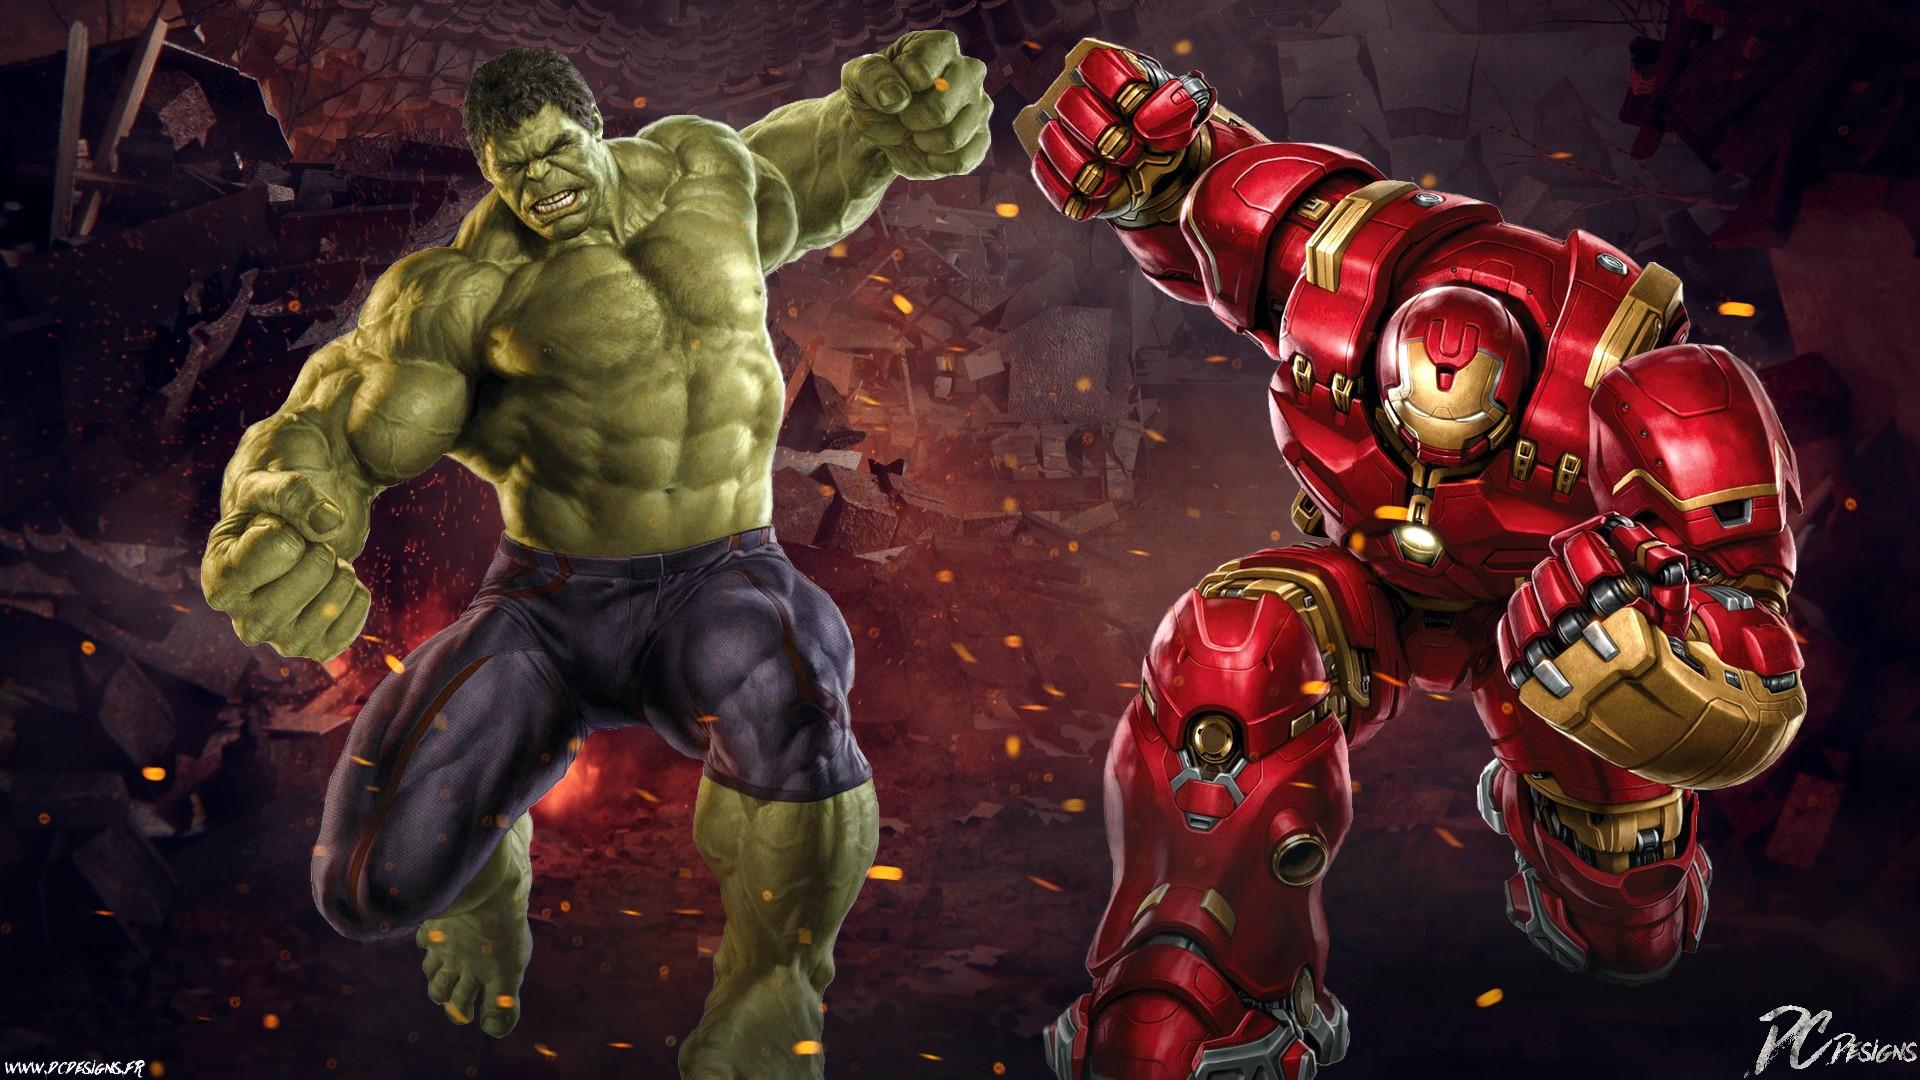 Hulk Iron Man Age of Ultron HD Wallpaper 2636 1920x1080